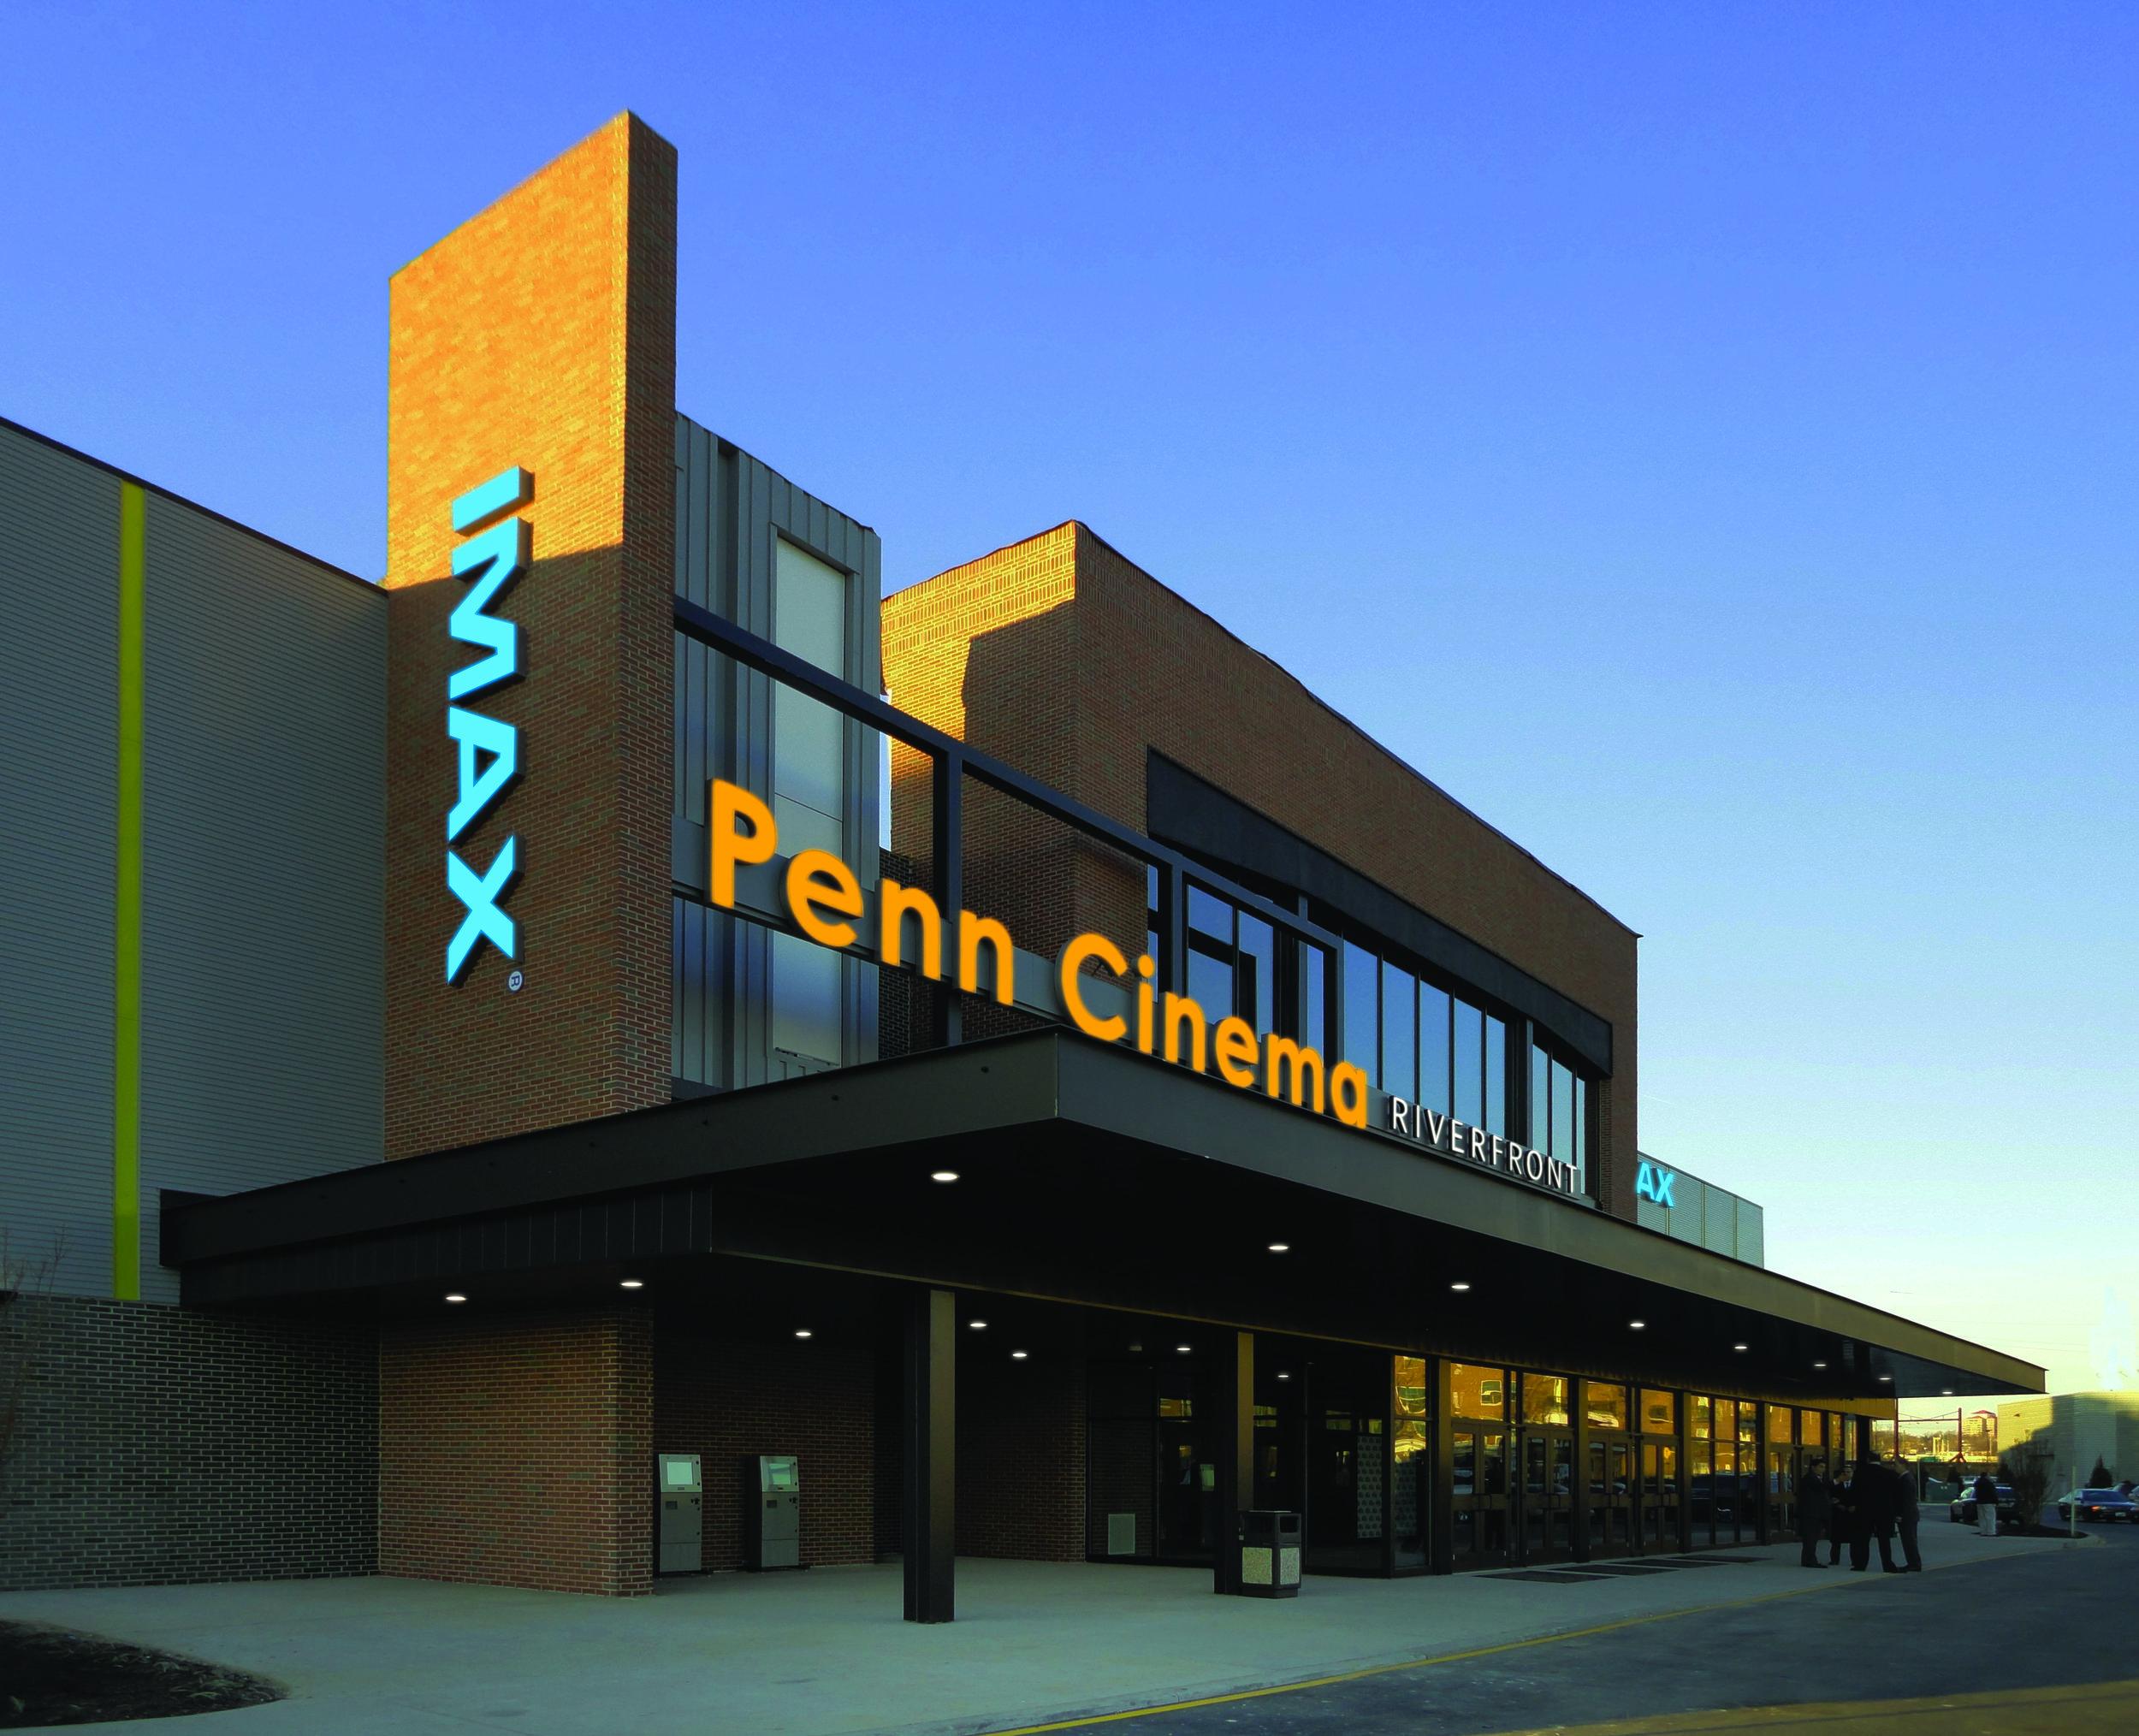 Penn Cinema & IMAX Theater at Wilmington Riverfront, DE